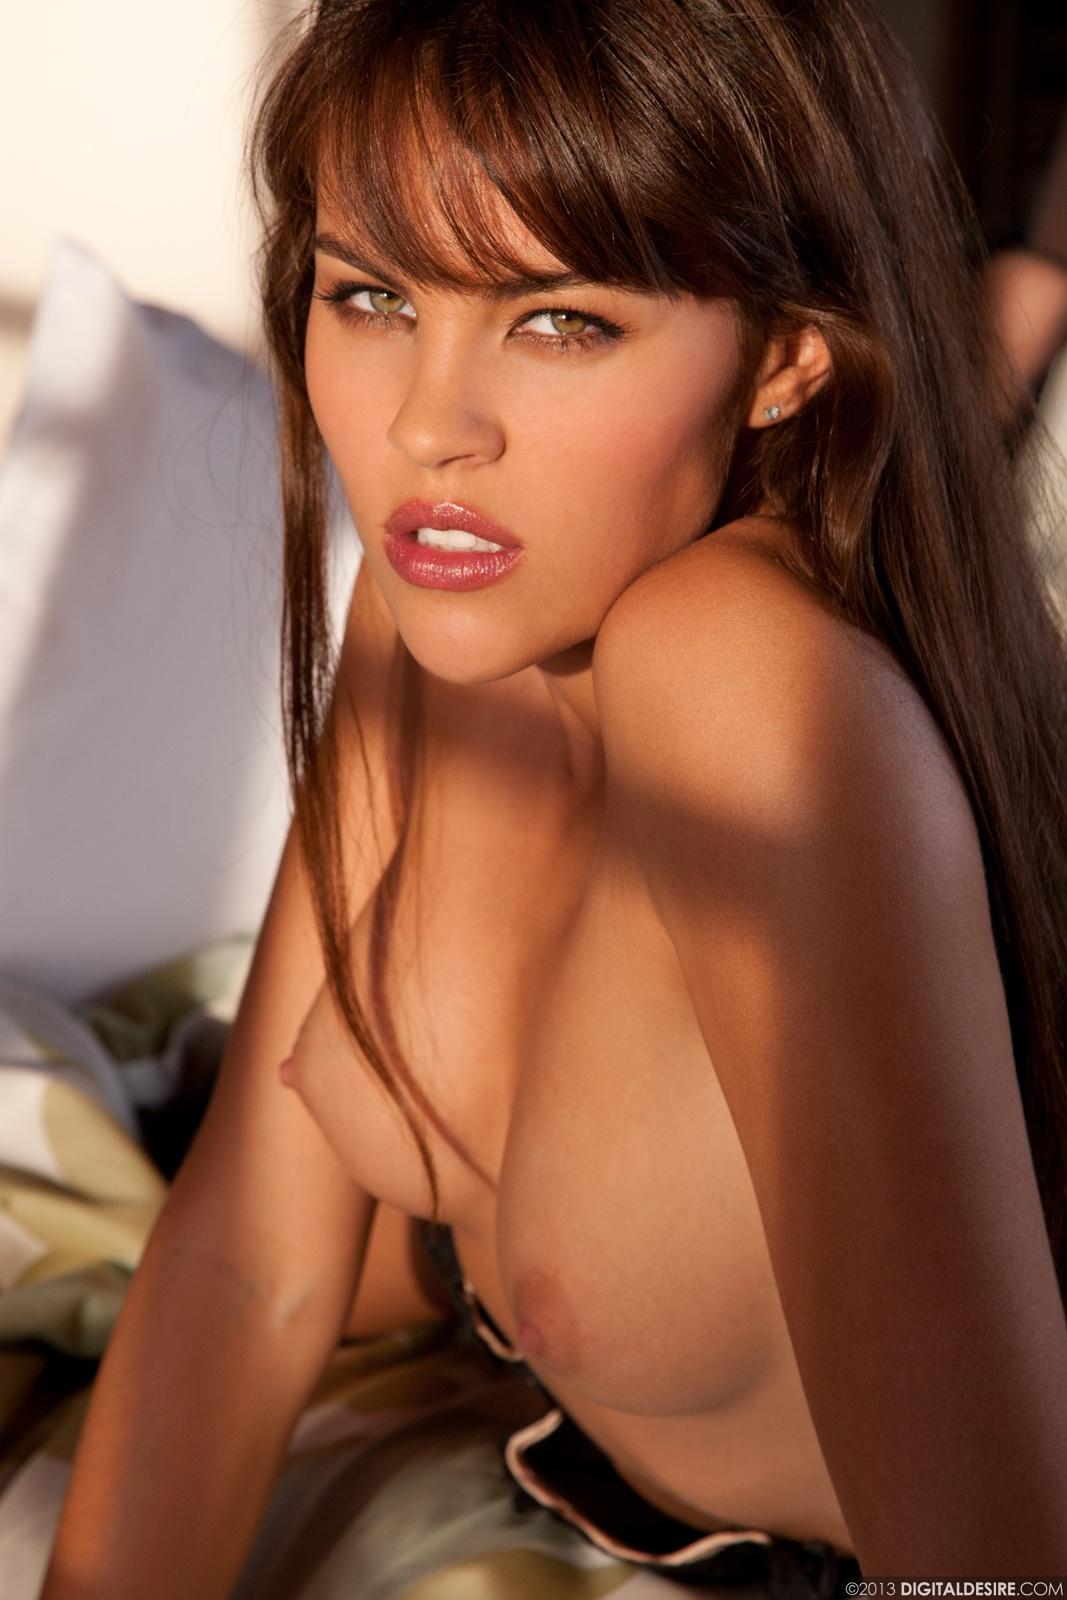 Victoria valmer nude blowjob exclusively